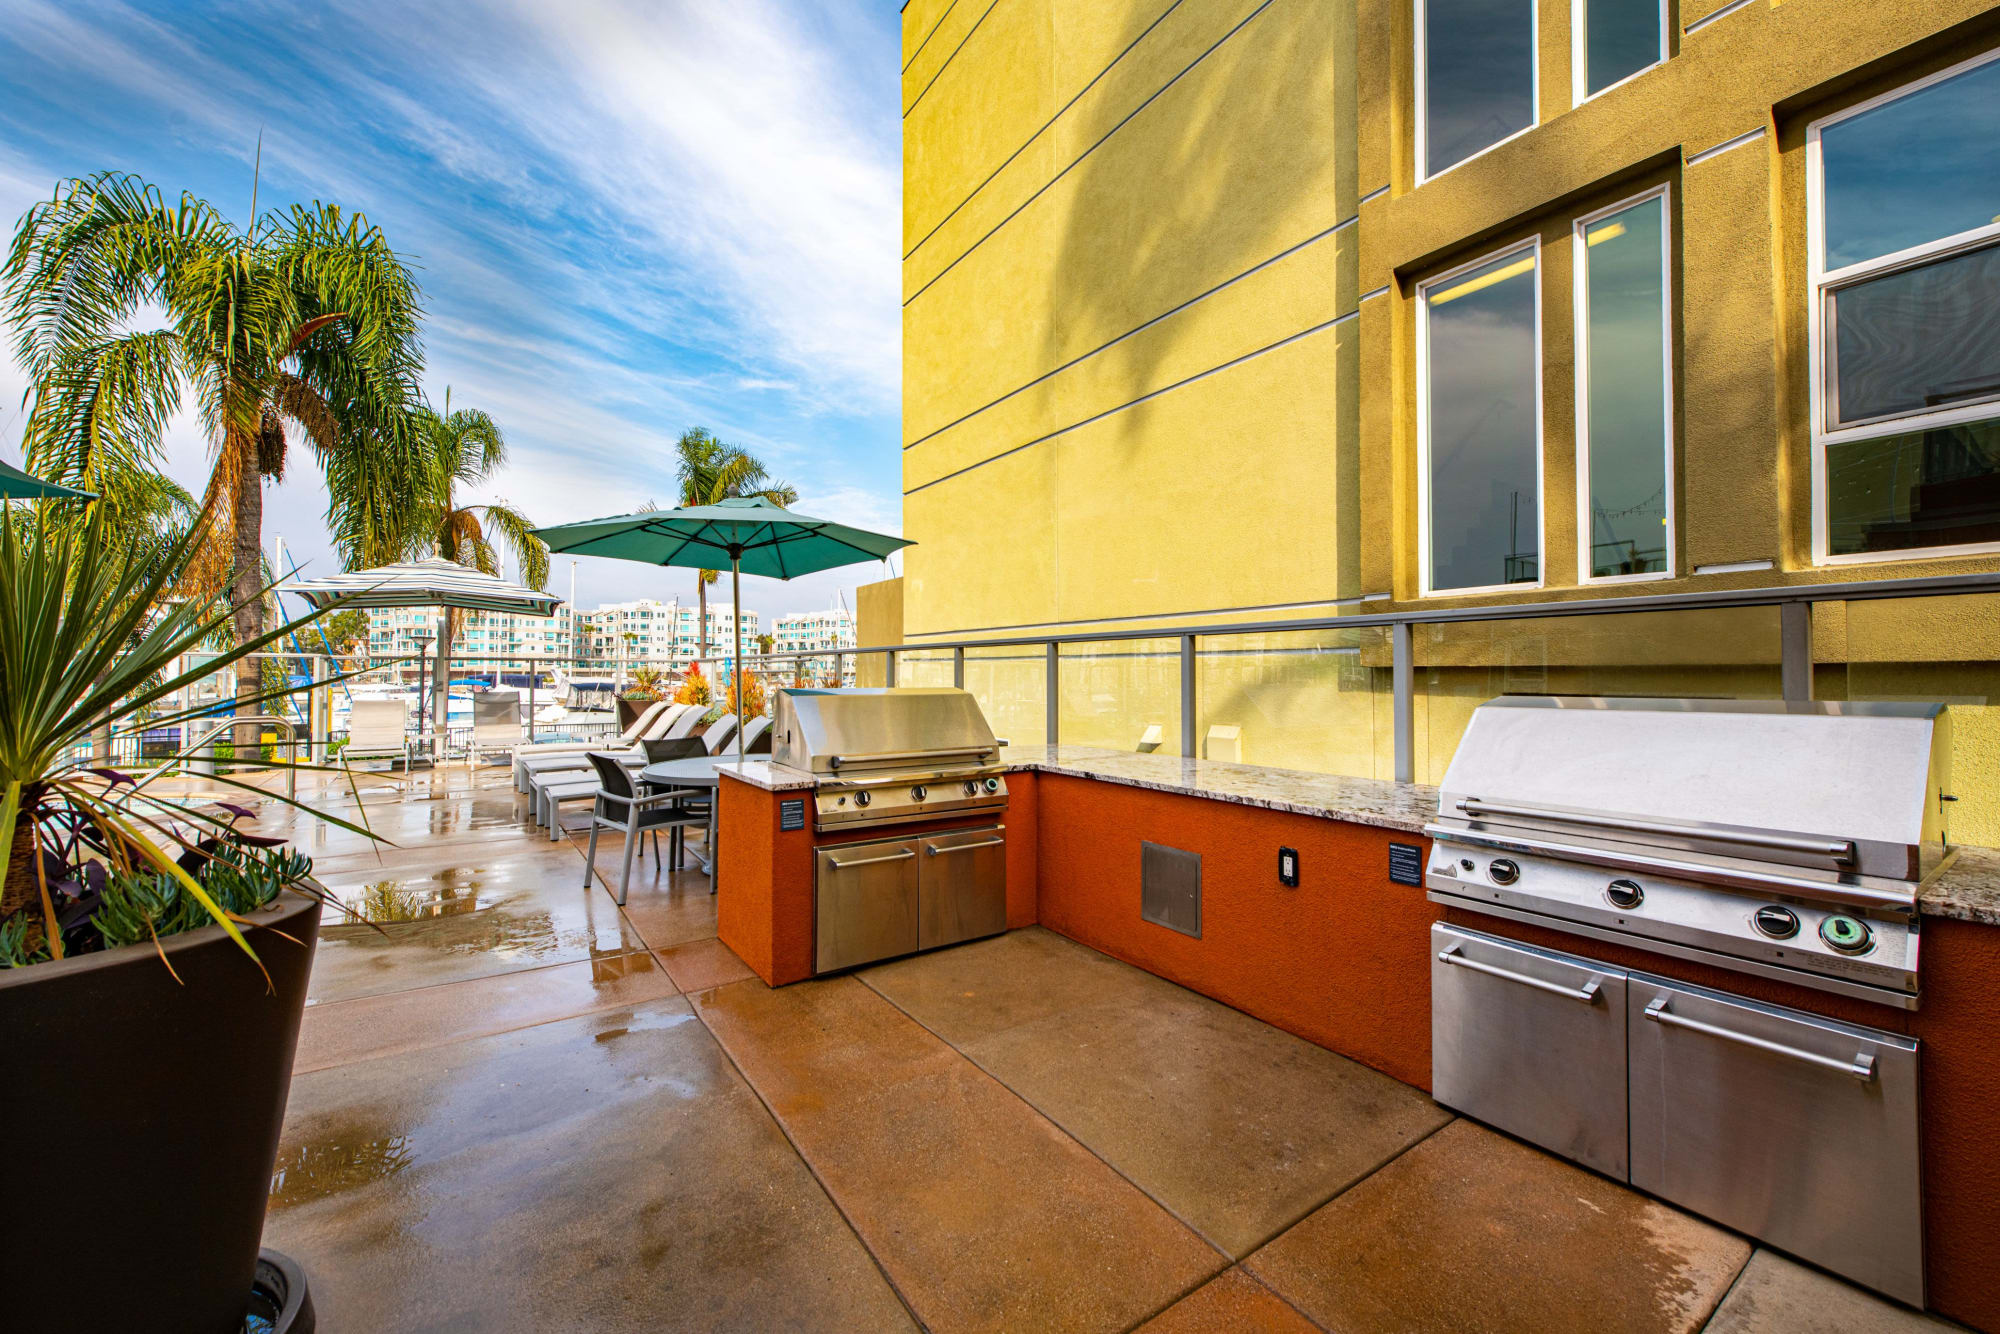 Outdoor barbecue area at Harborside Marina Bay Apartments in Marina del Rey, California